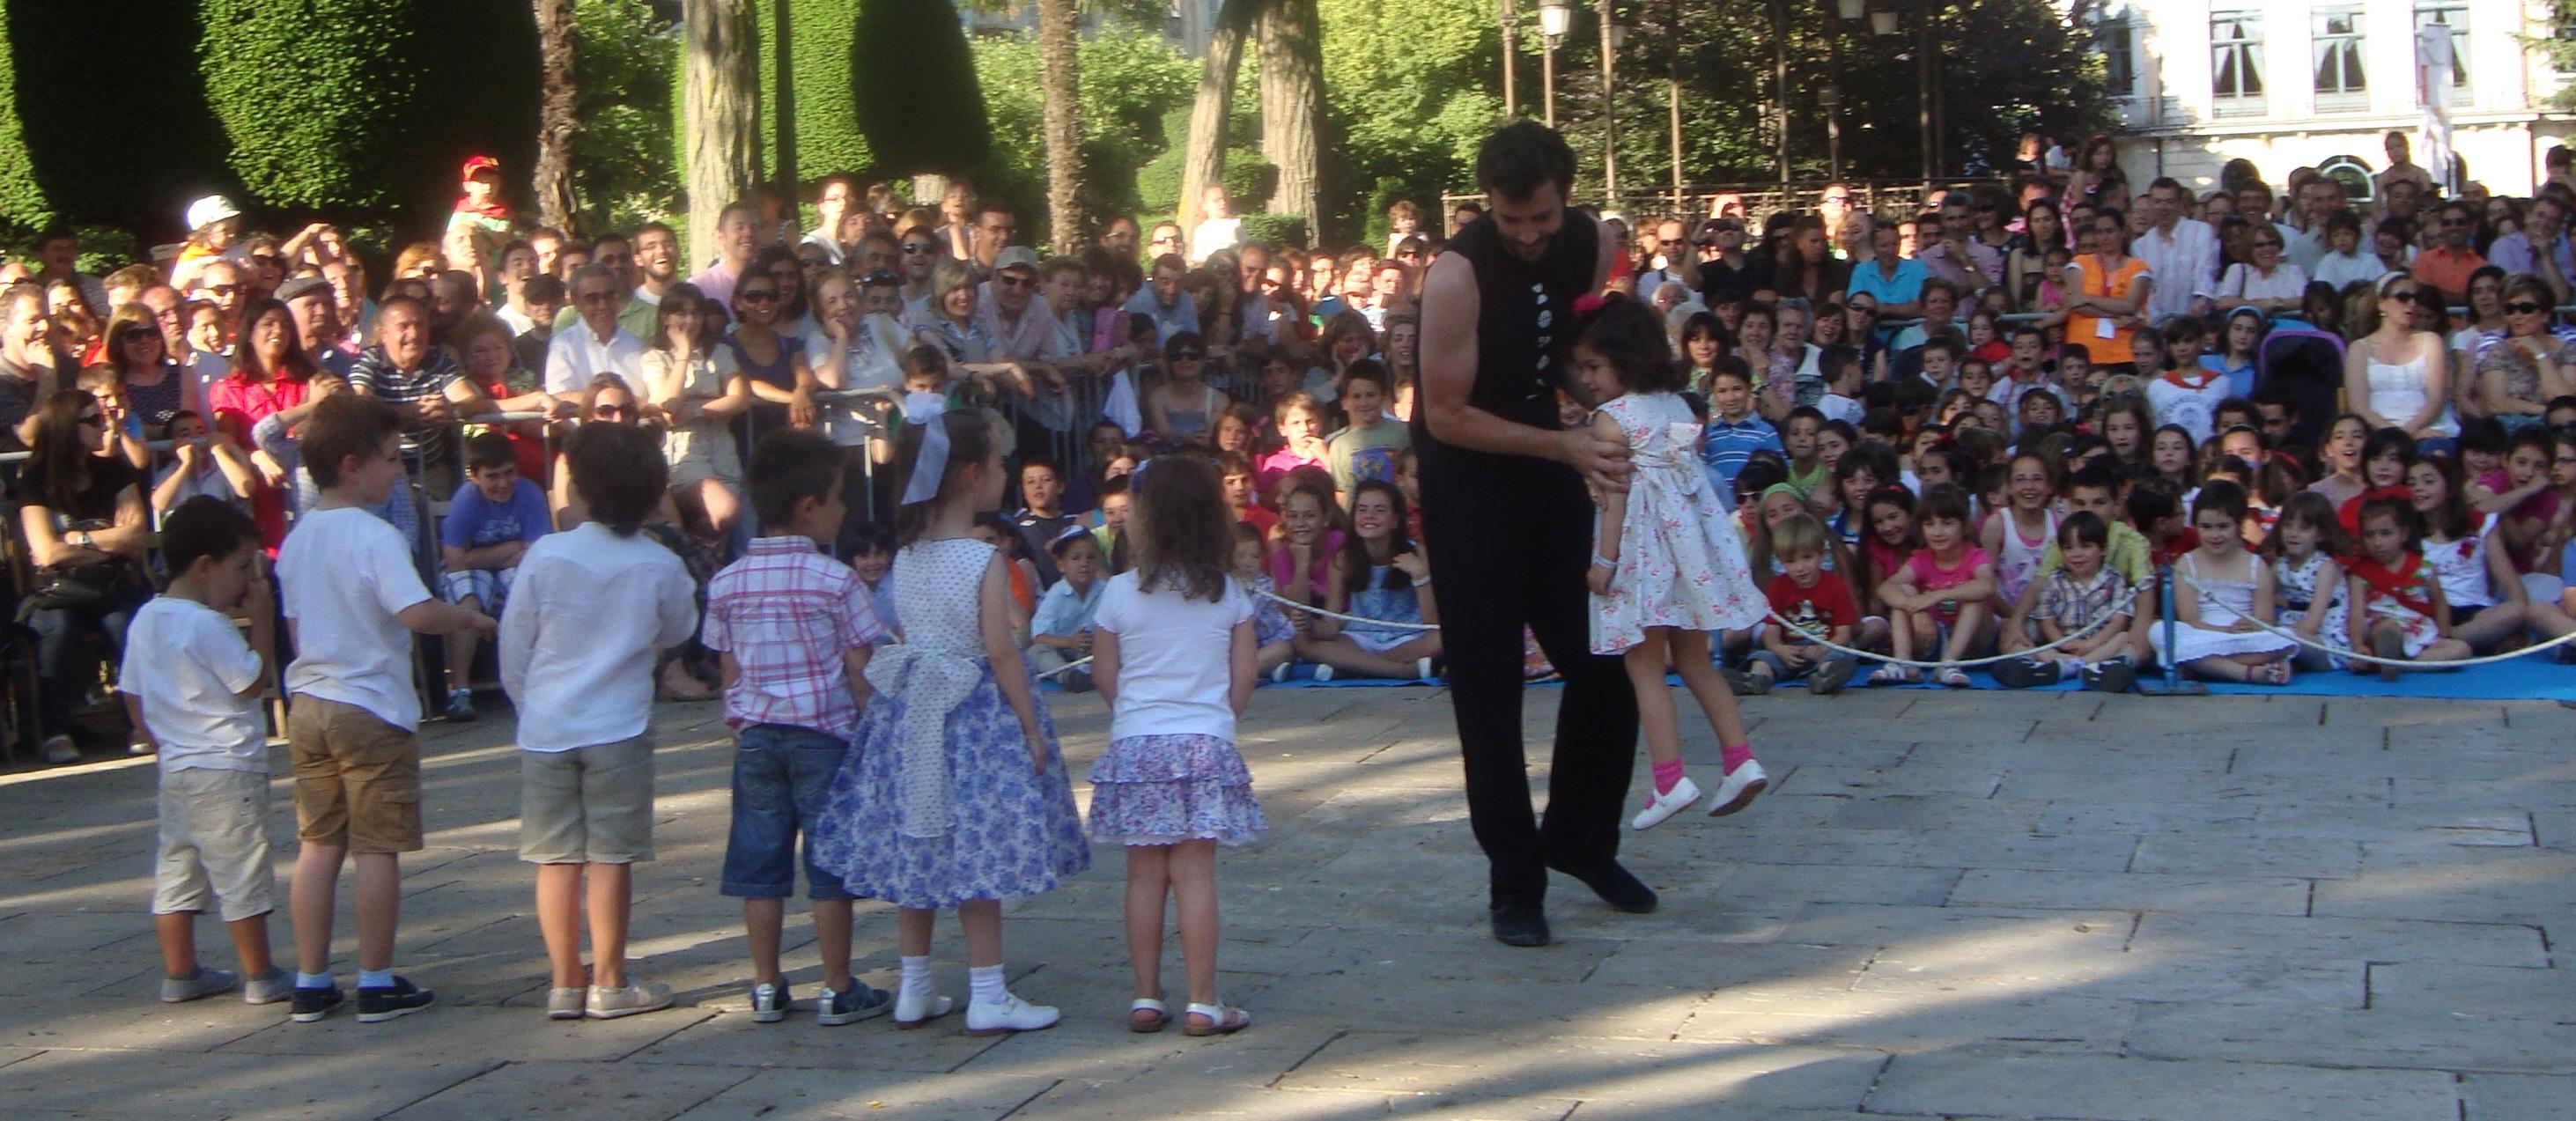 Fiestas de Burgos 2012